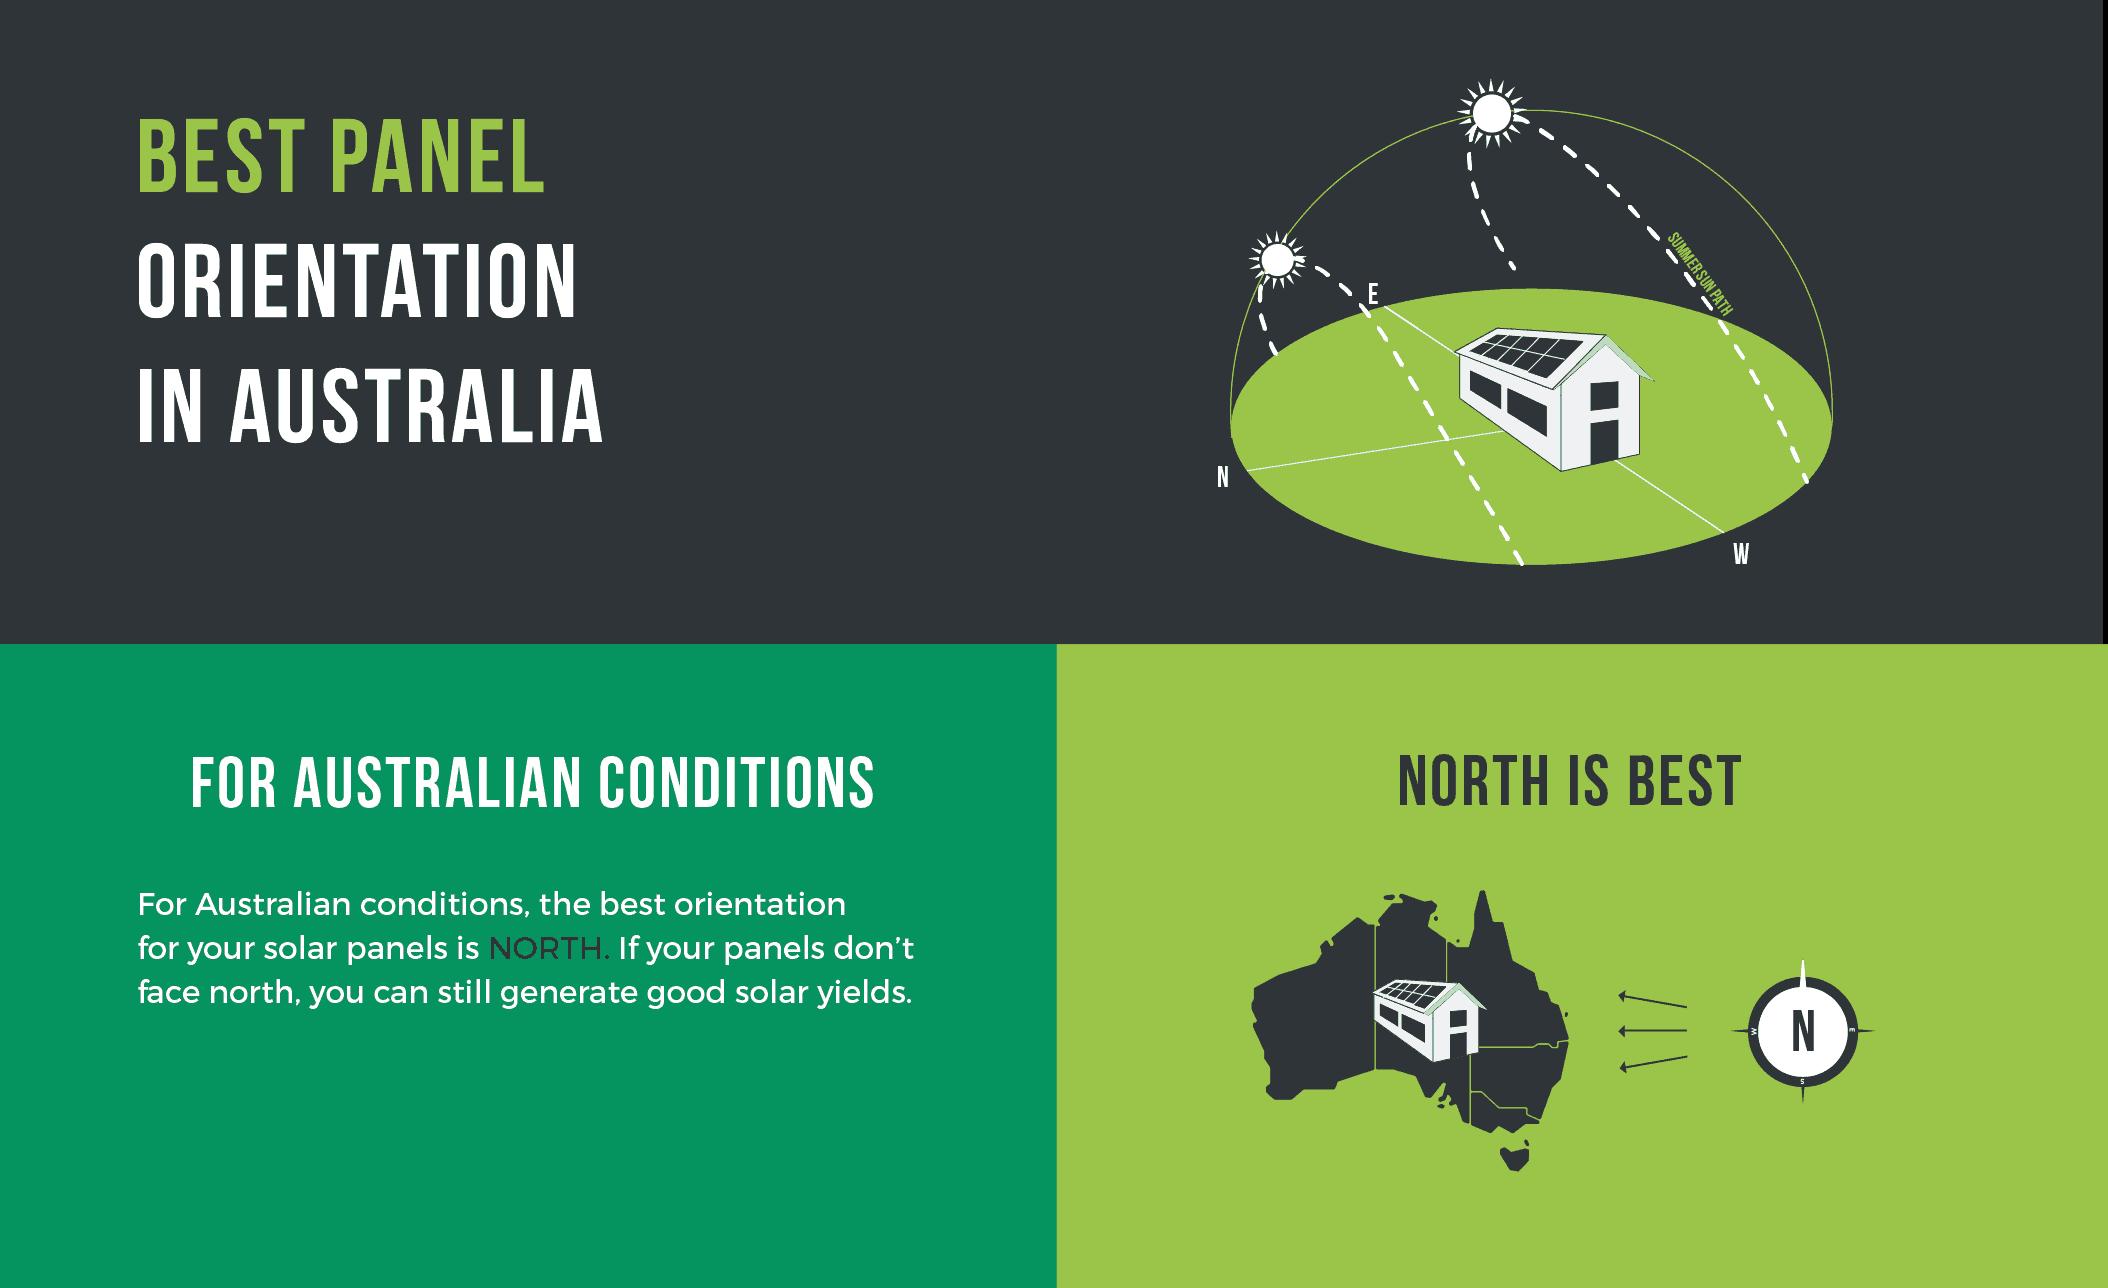 best-solar-panel-direction-in-australia-infographic